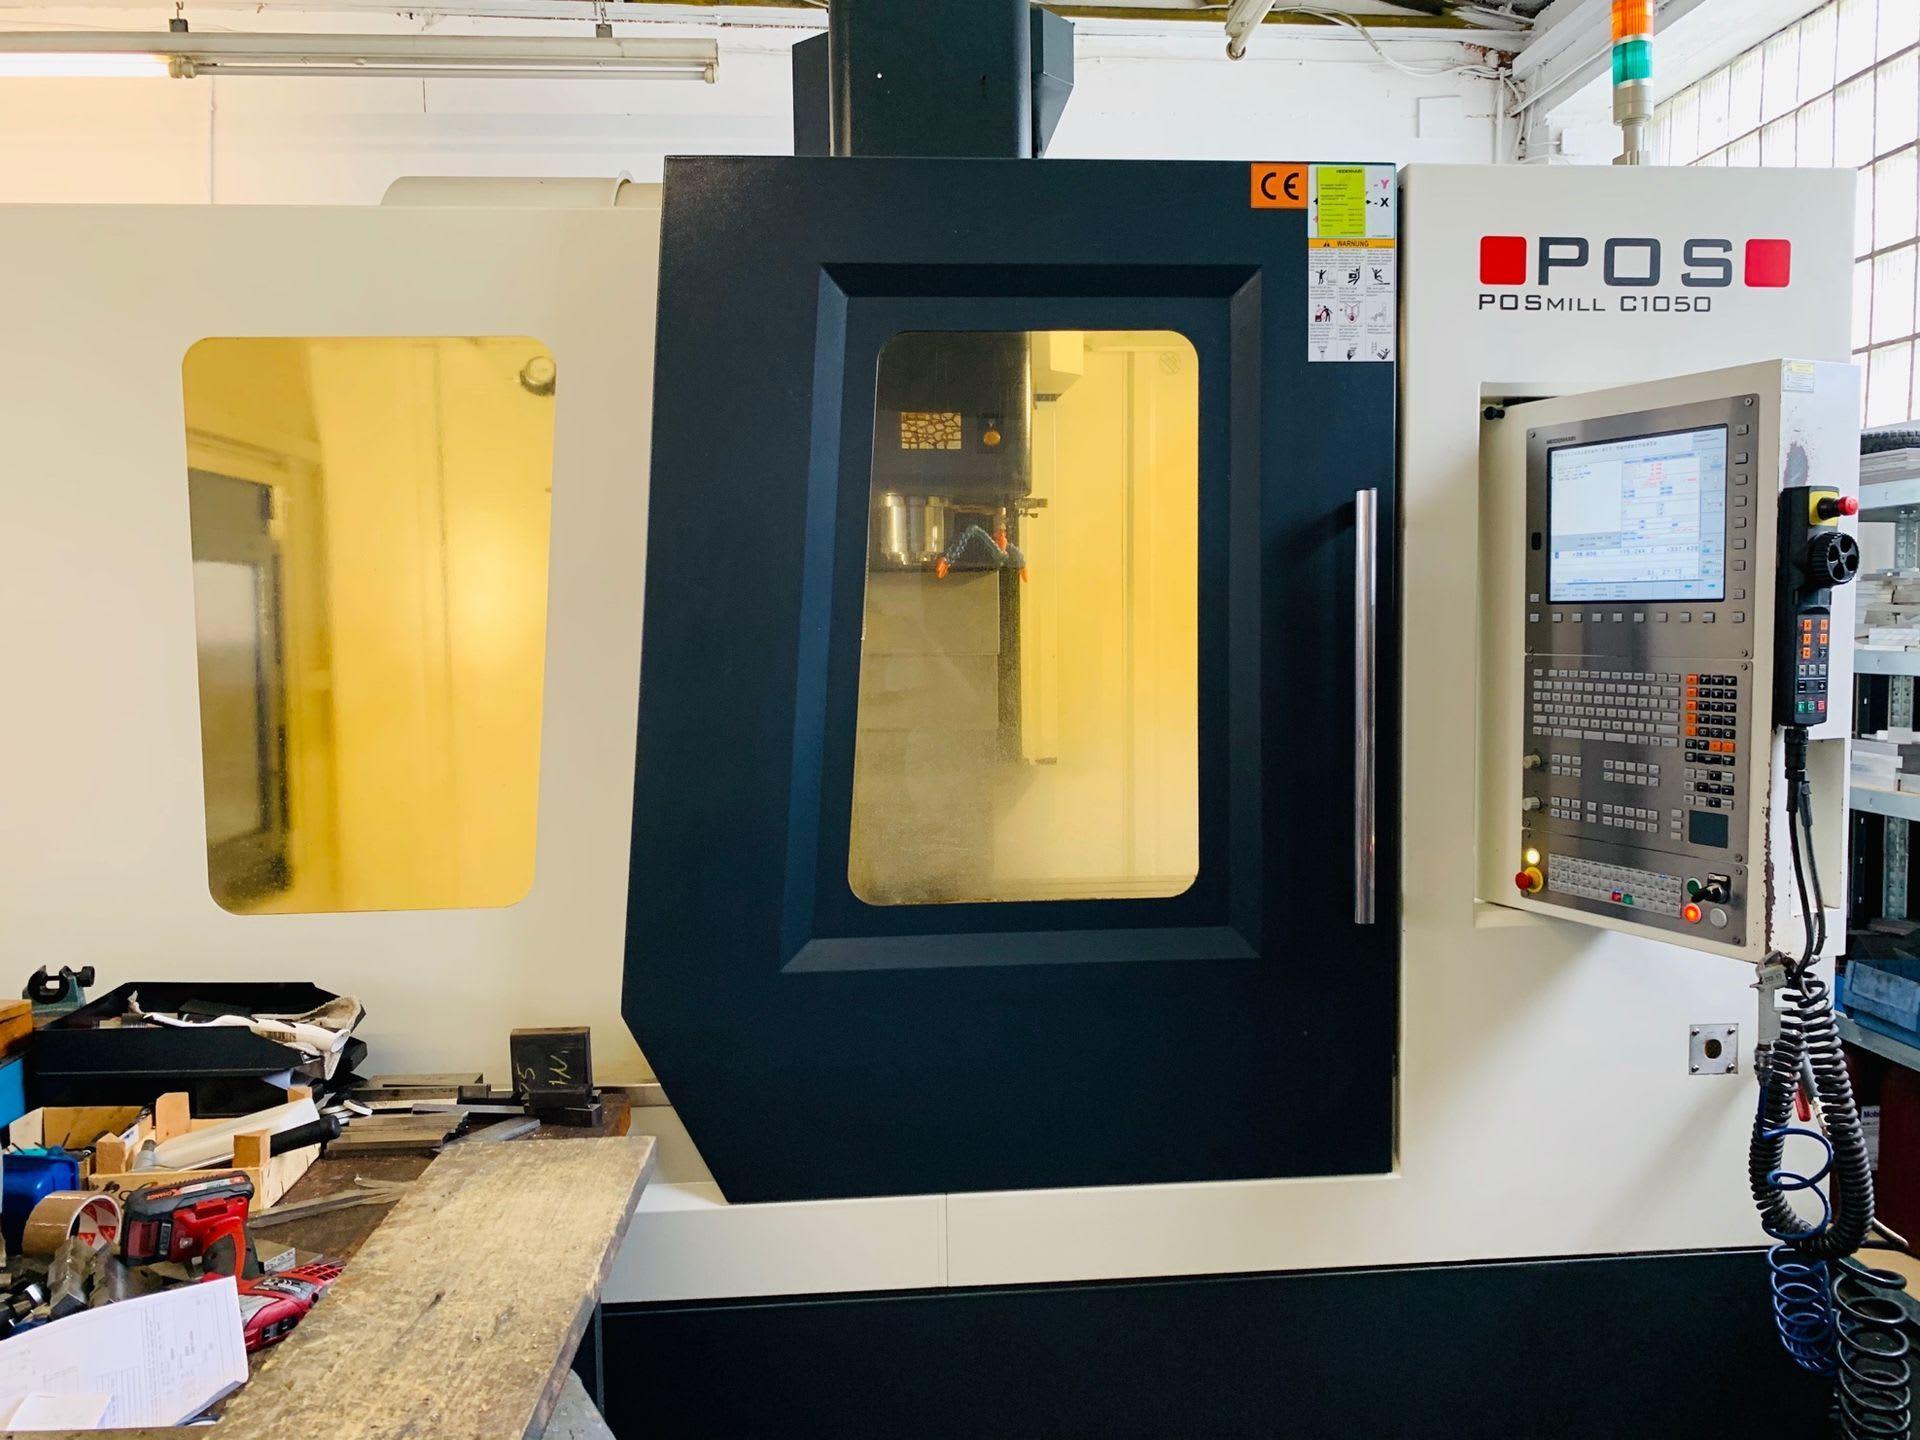 POS POSmill C 1050 Vertikal-Bearbeitungszentrum